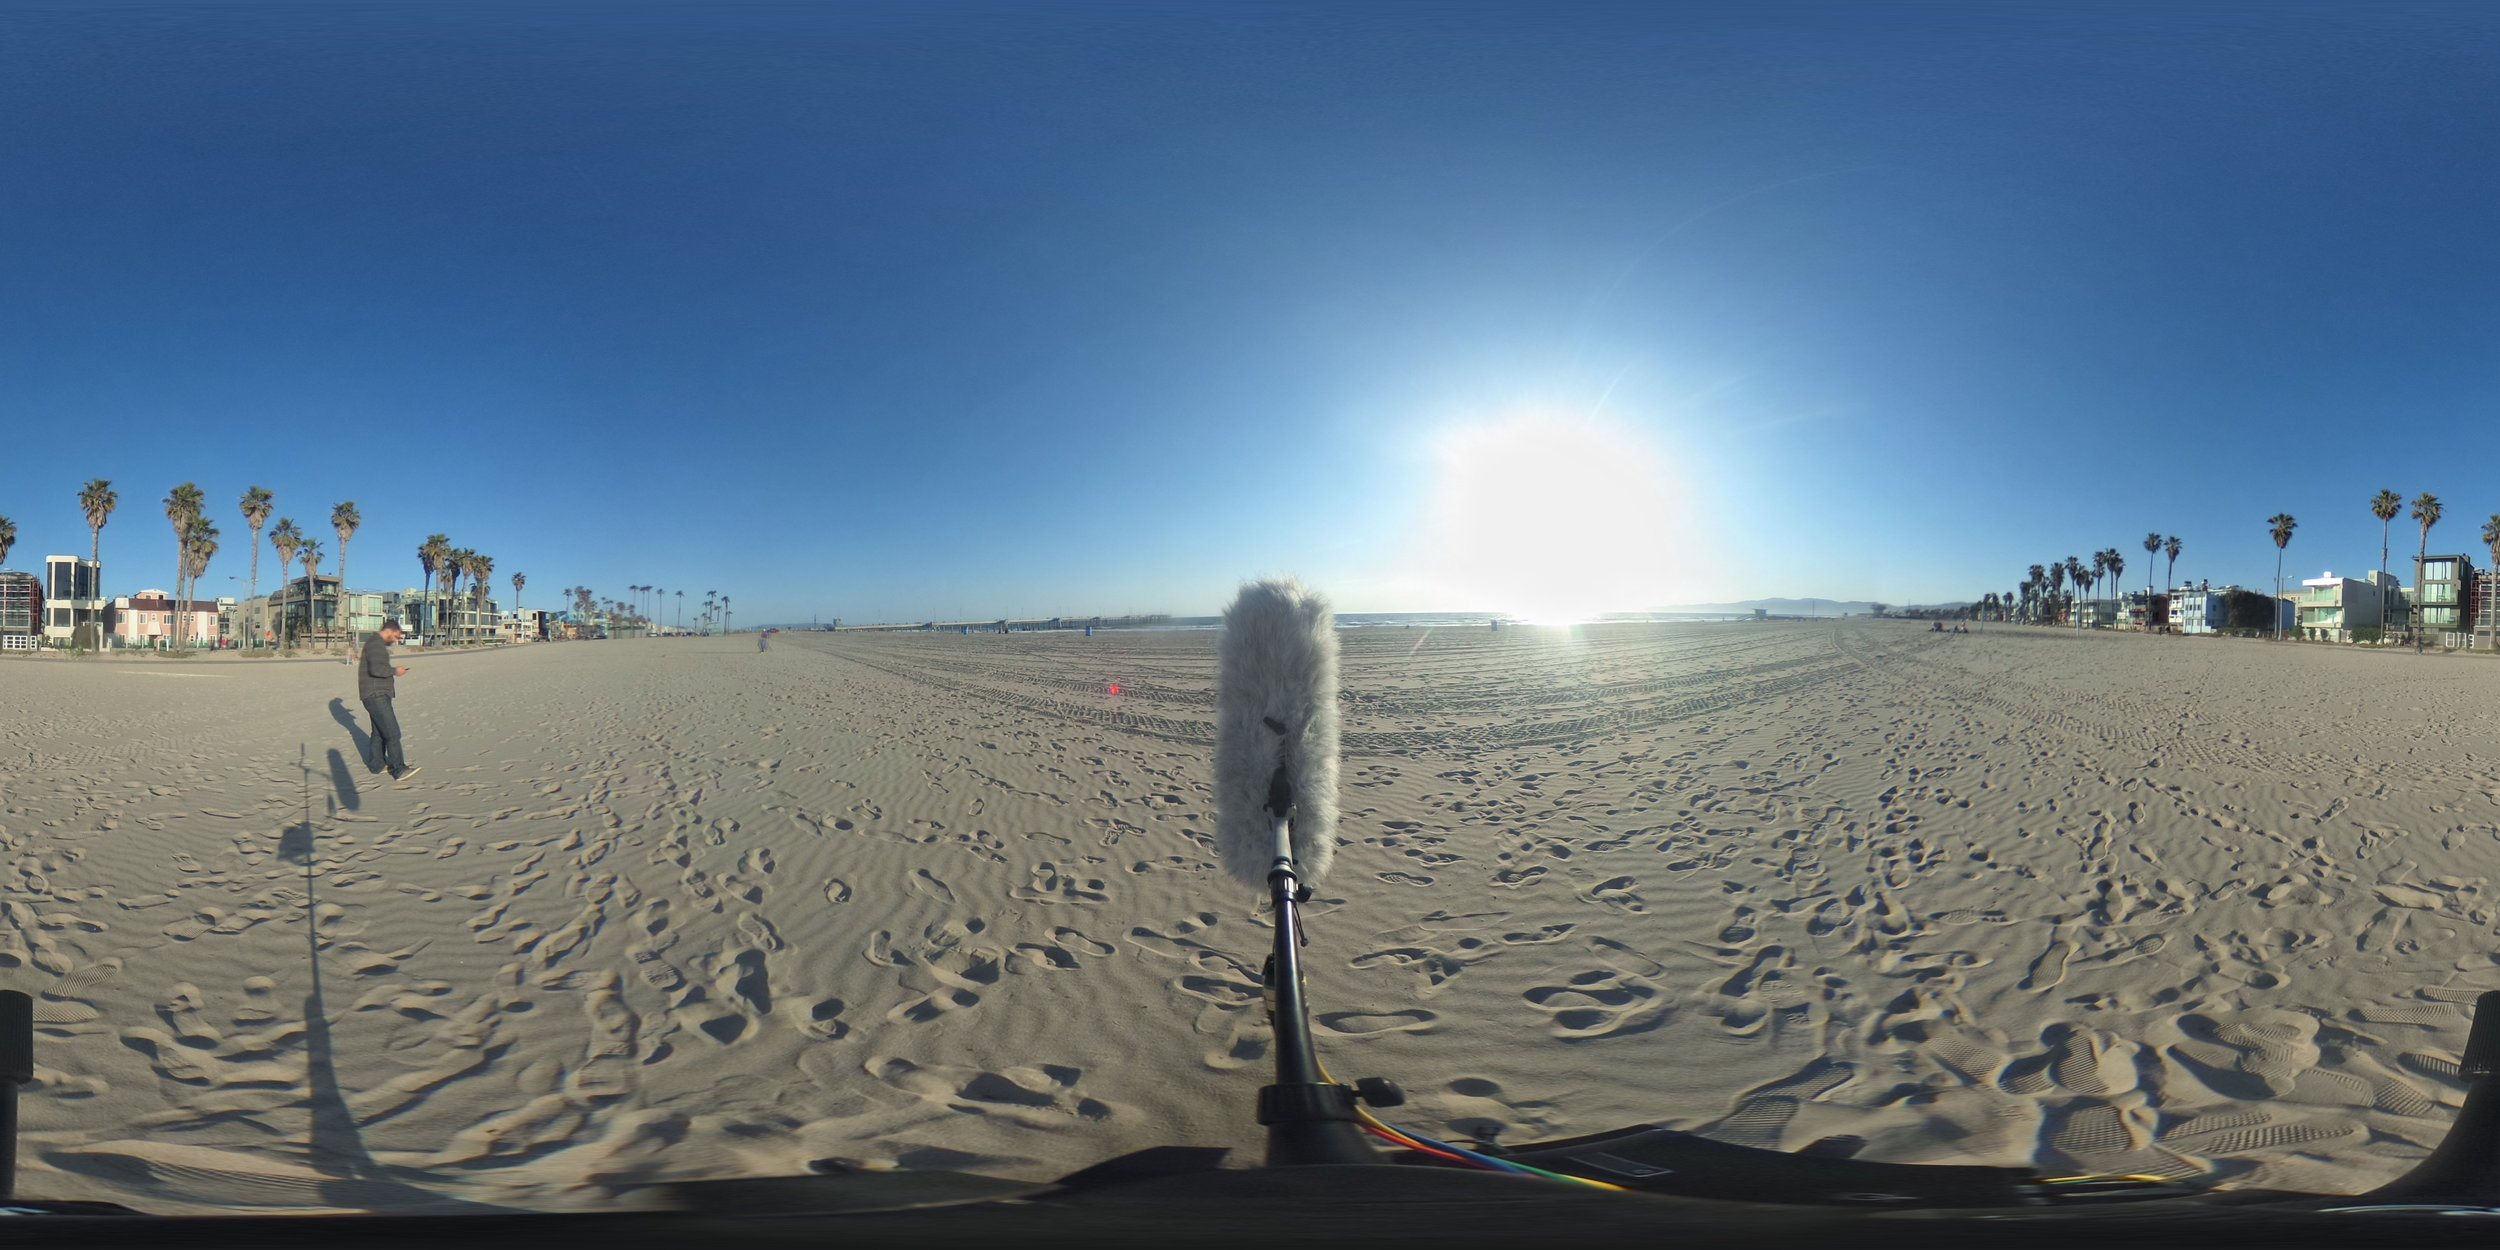 EXT_Day_Beach_CityHum_DistantPlanesOverhead_DistantWaves_DistantWalla_JPEG.JPG